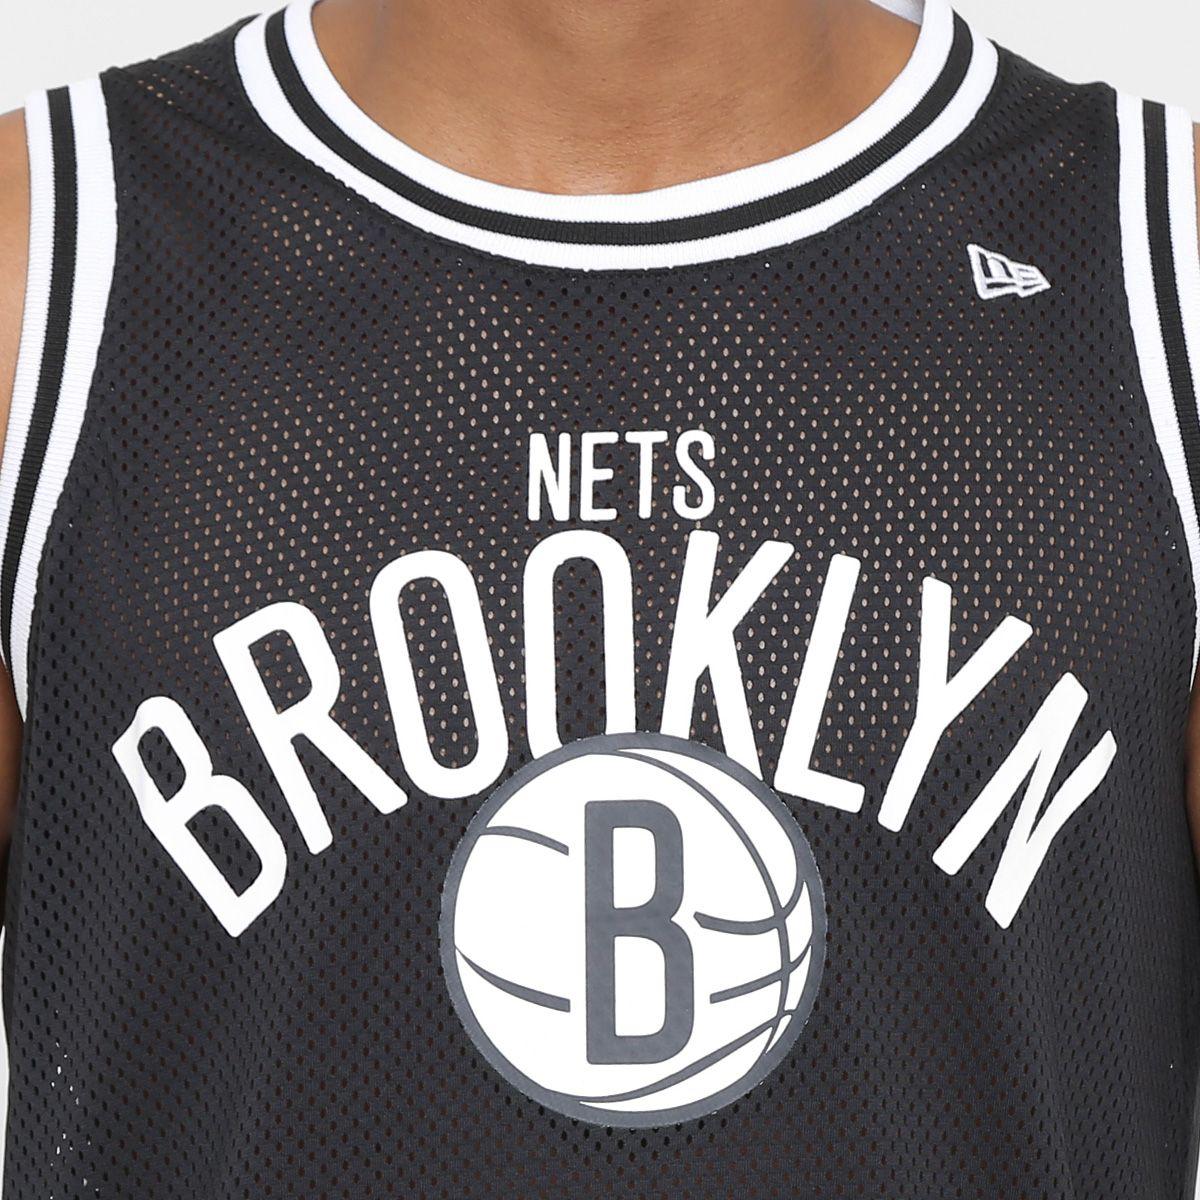 a979c08b48 Camiseta Regata NBA Brooklyn Nets New Era Jersey Game Masculina ...